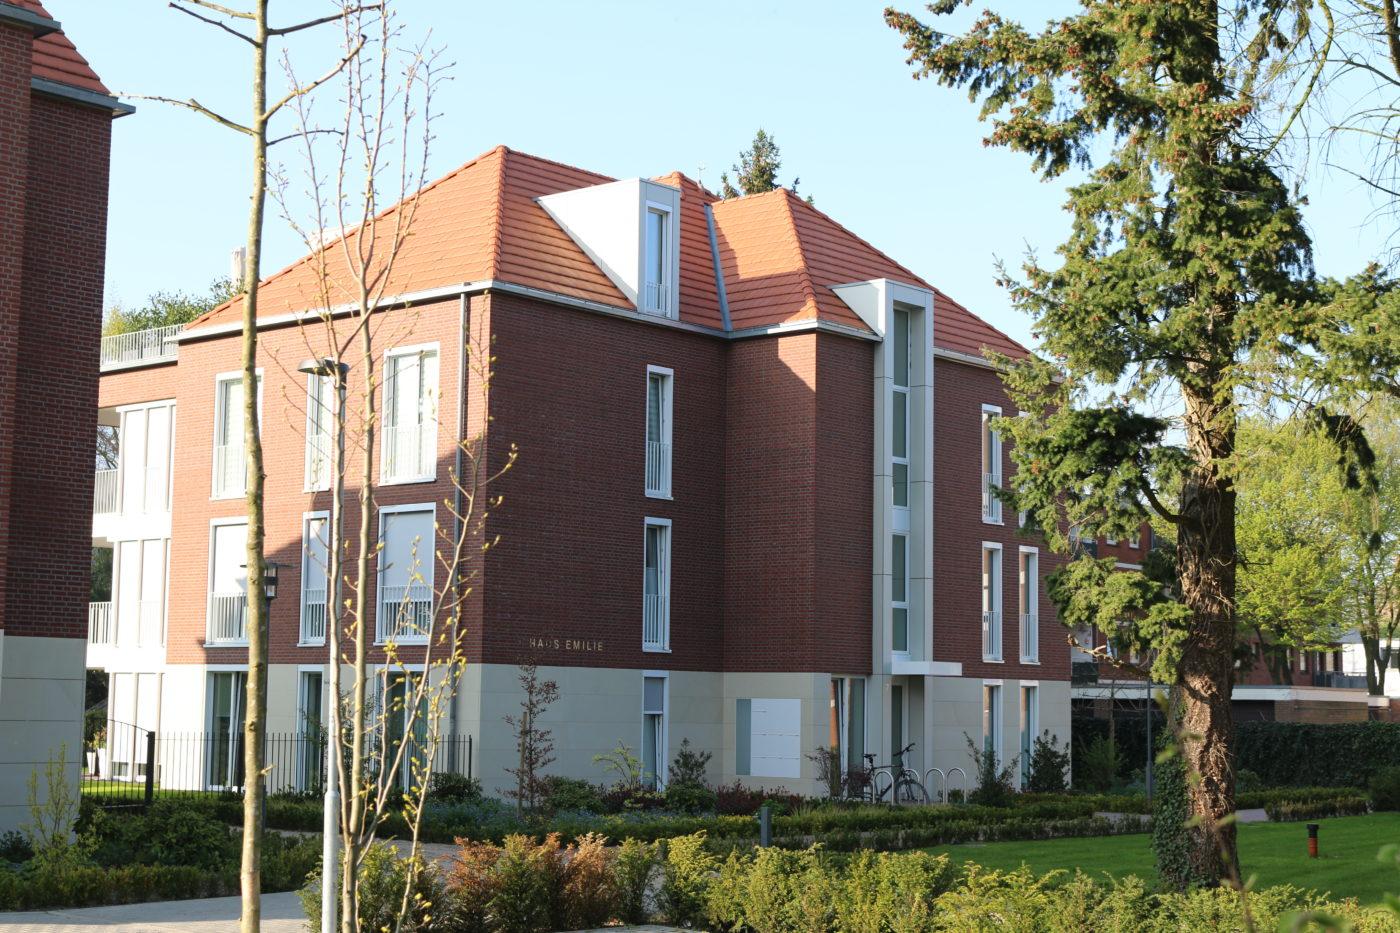 Duttingpark_in_Nordhorn2